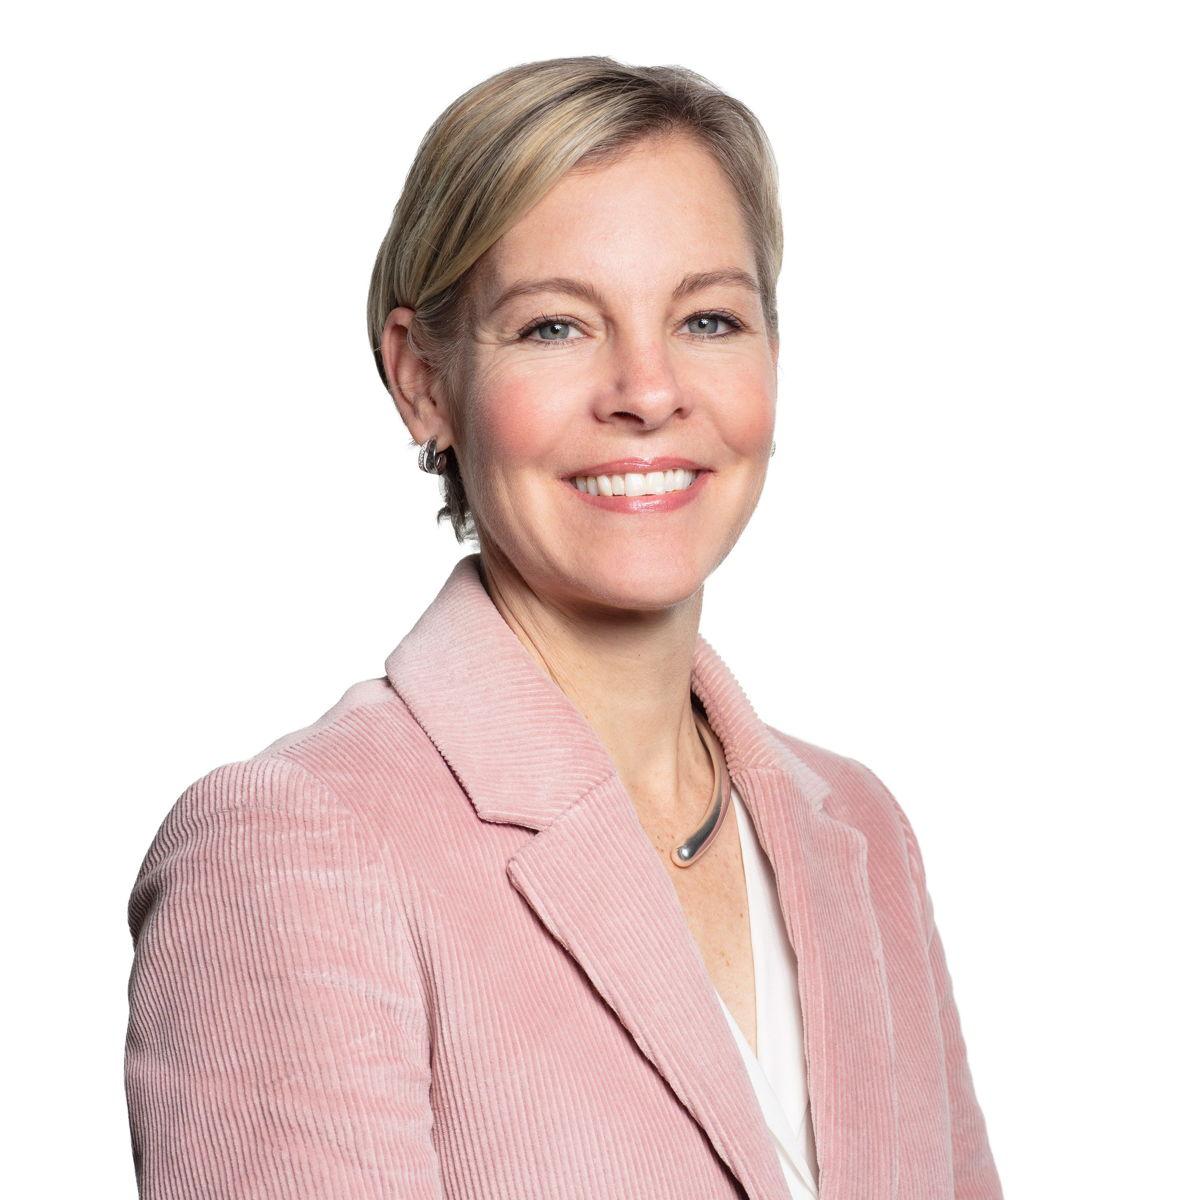 Keri Gilder, CEO Colt Technology Services